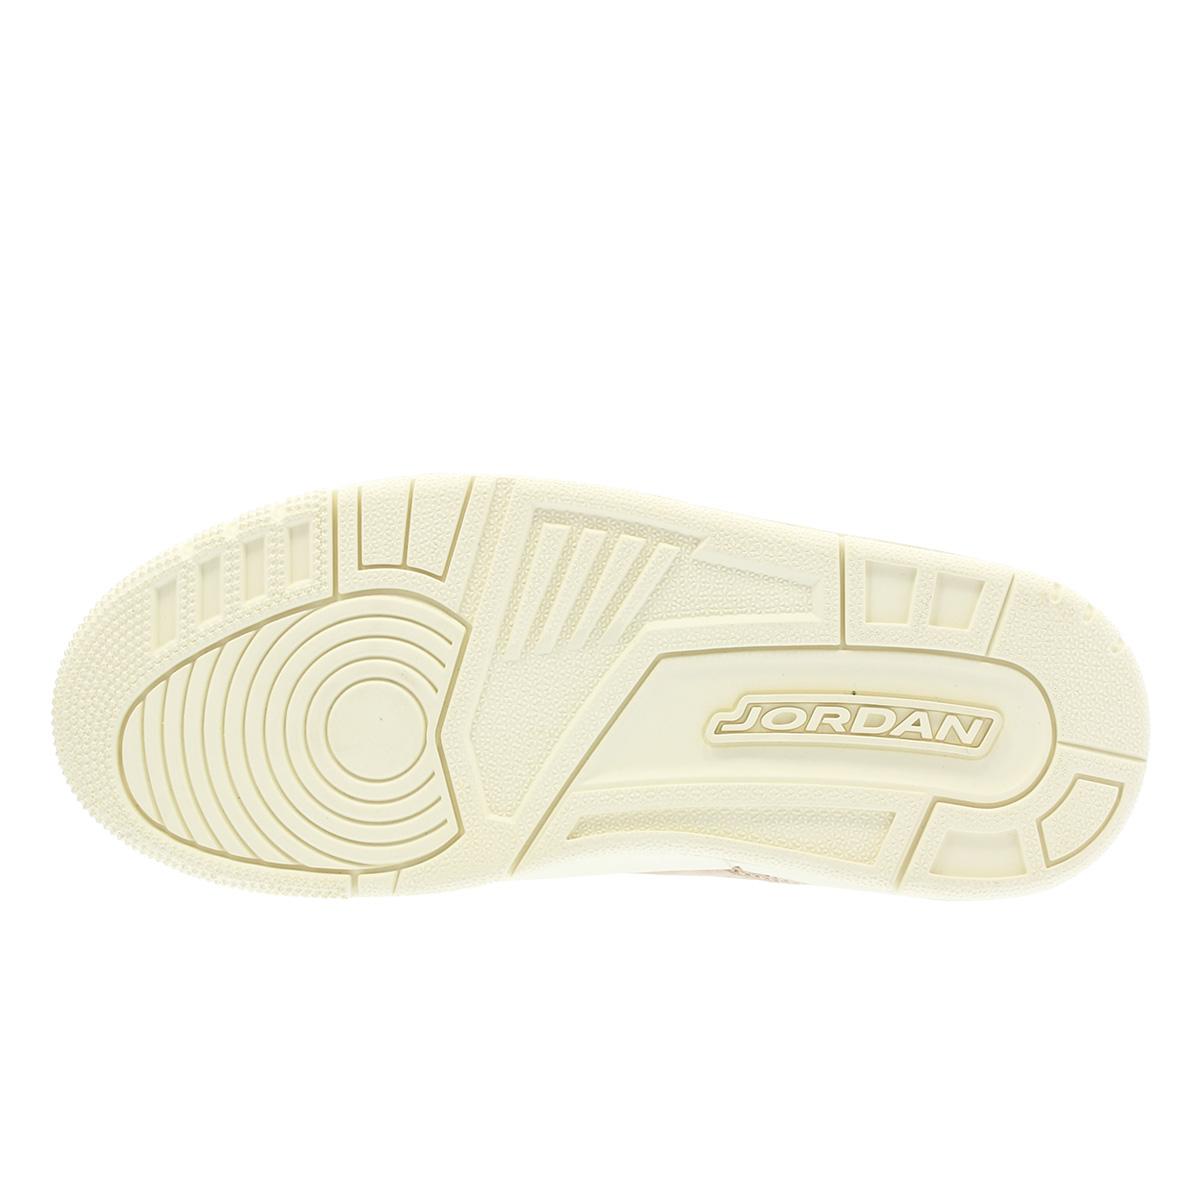 d894955583f9 NIKE WMNS AIR JORDAN 3 RETRO SE Nike women Air Jordan 3 nostalgic PARTICLE  BEIGE METALLIC RED BRONZE SAIL ah7859-205